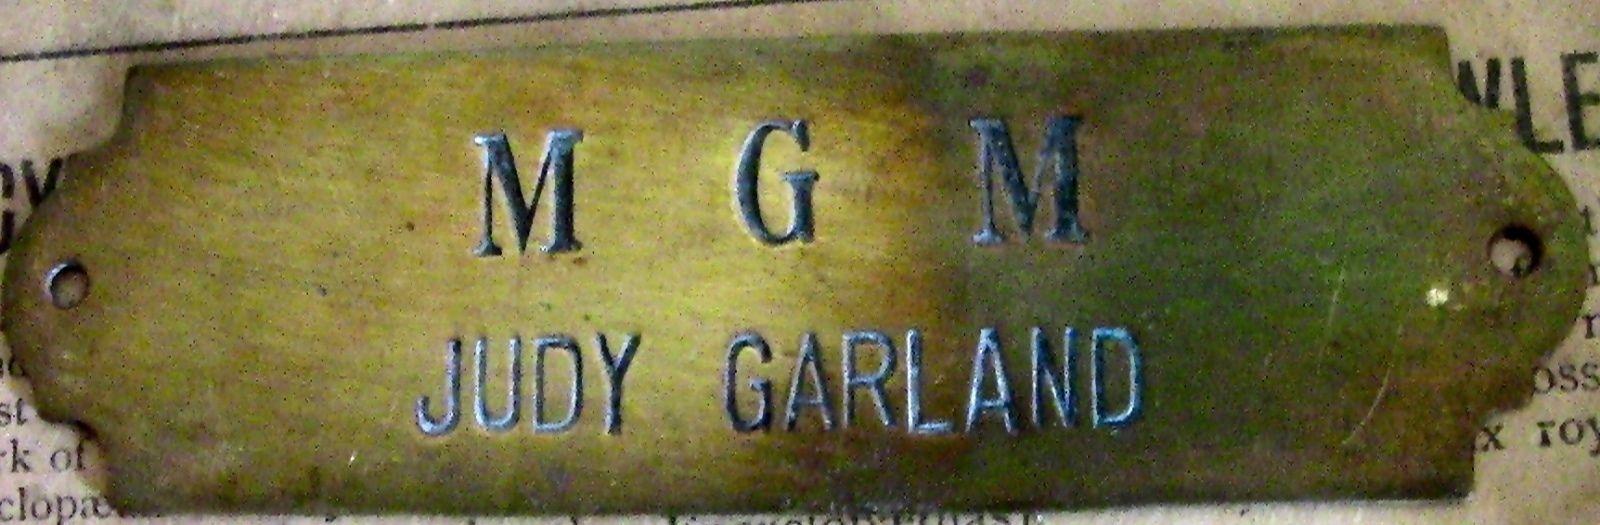 mgm dressing room tags 01